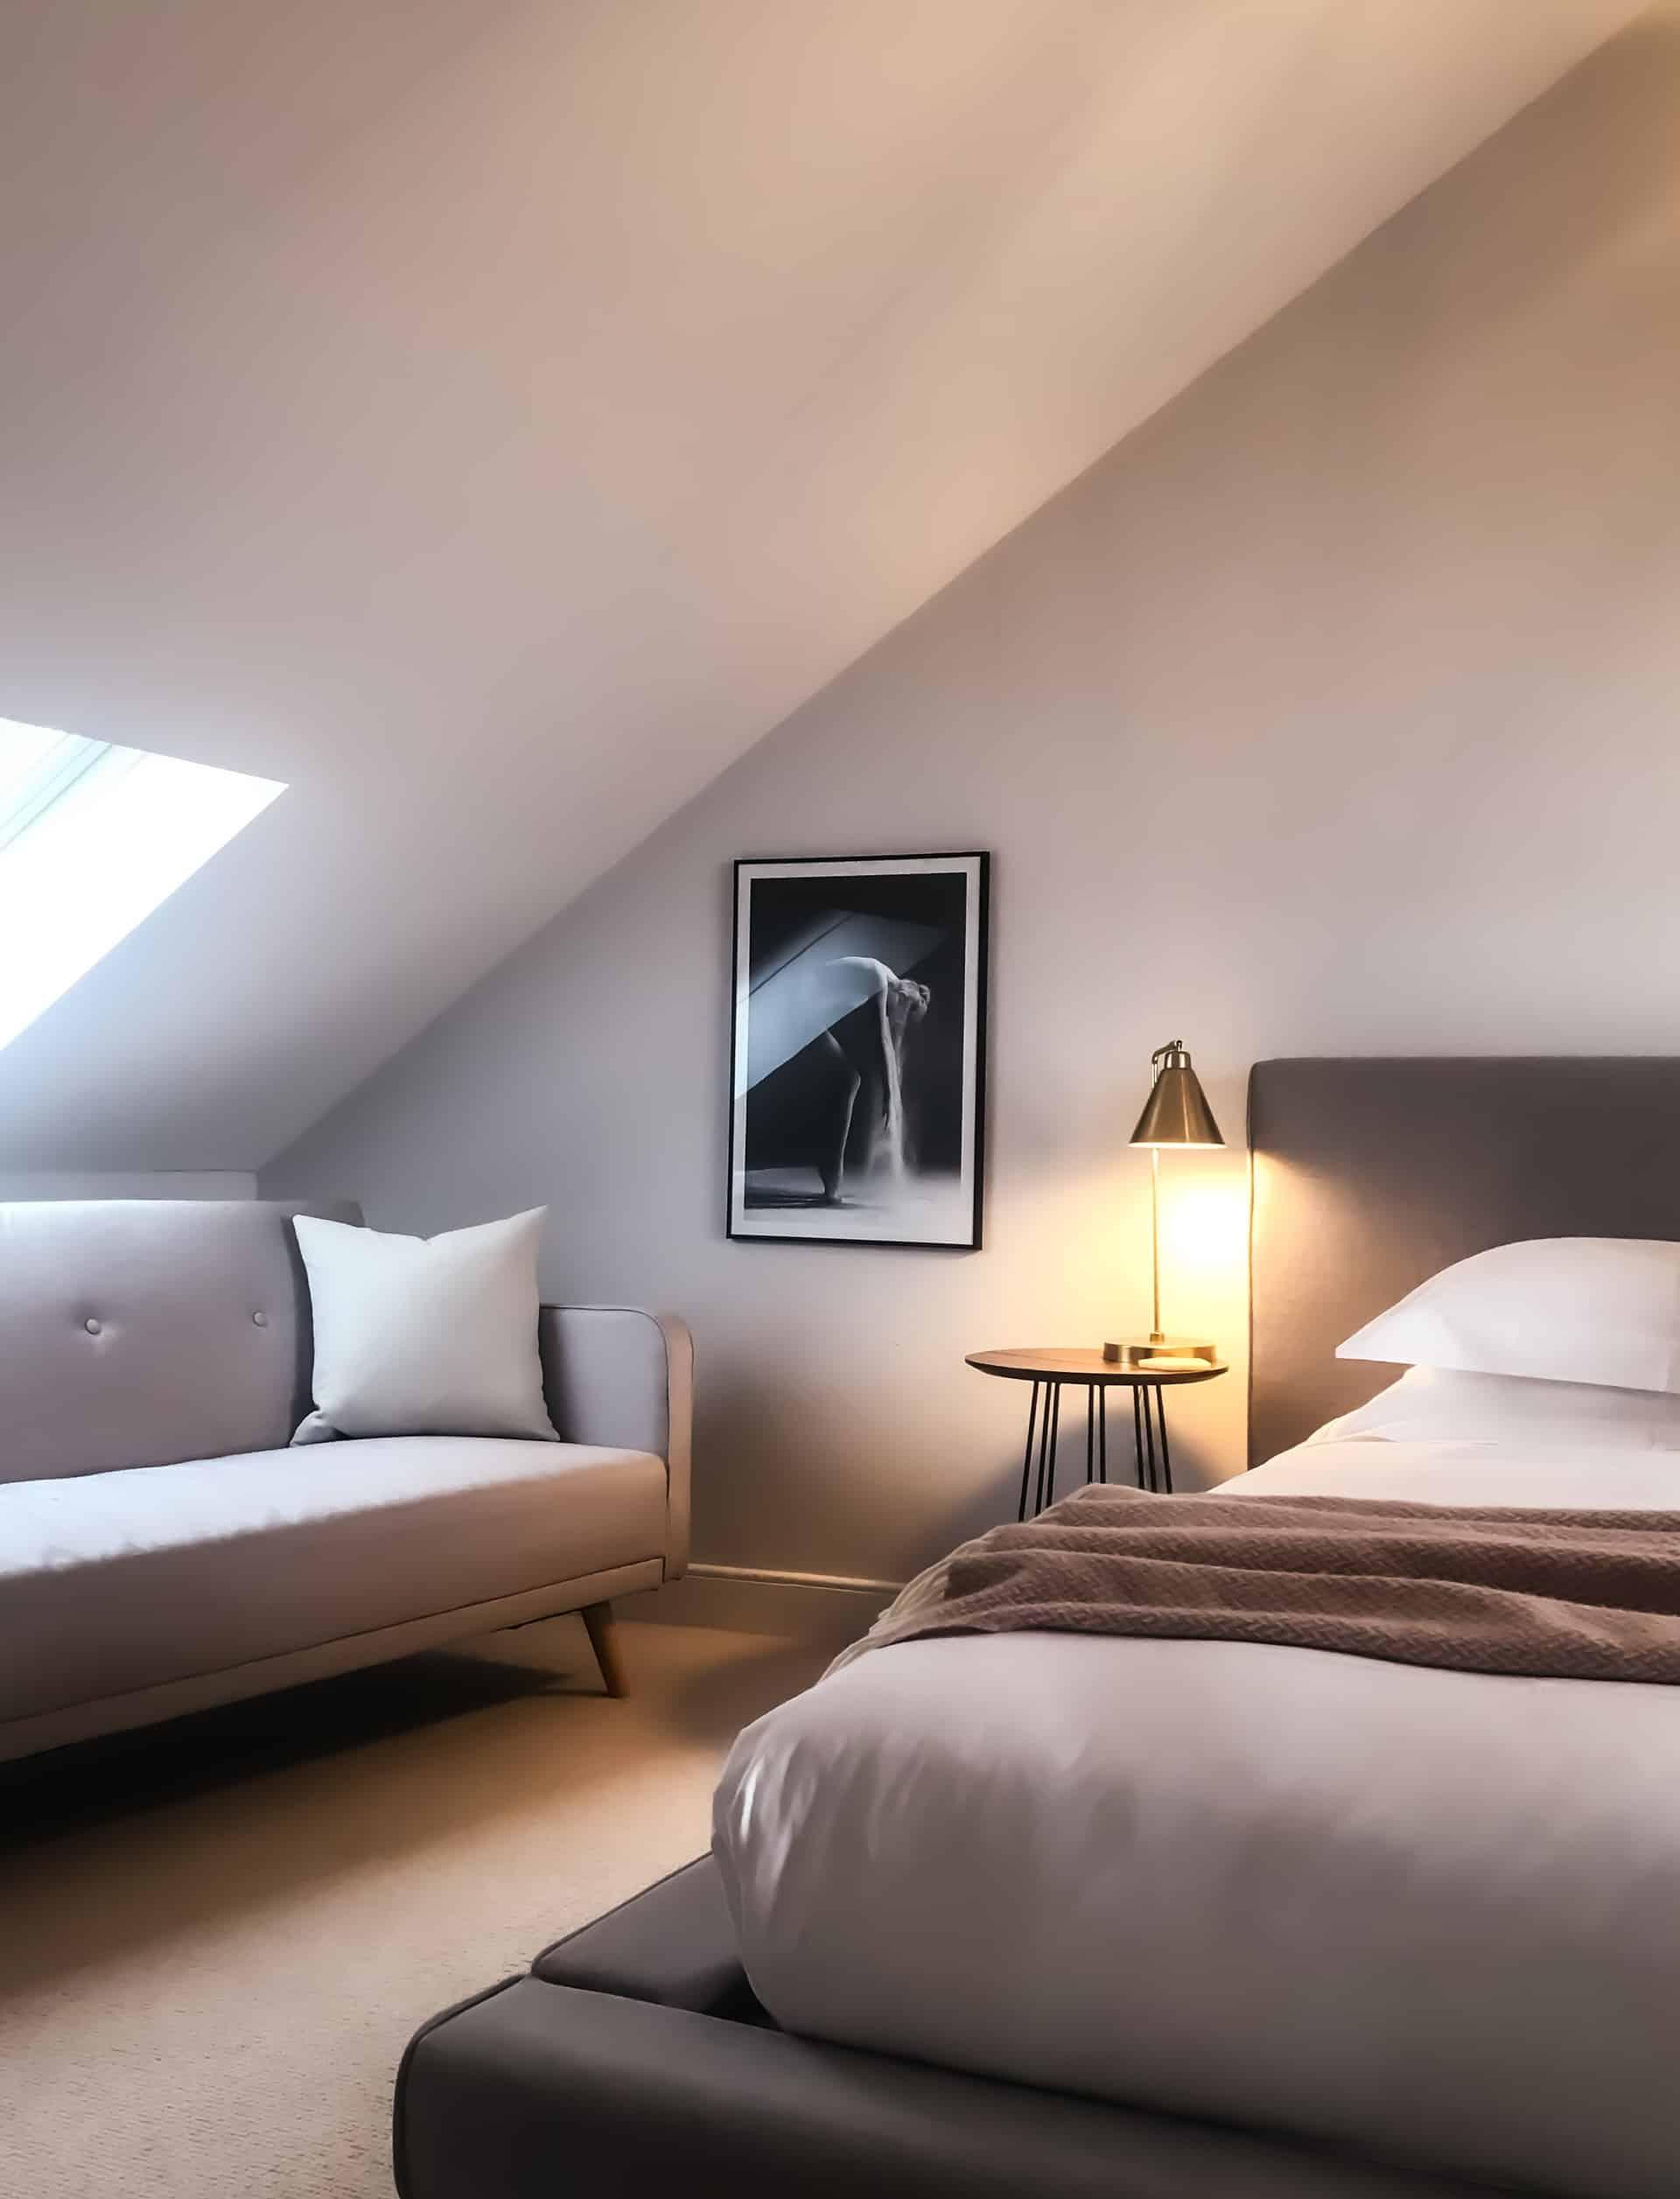 Bedroom Interior Design Tips Article Image